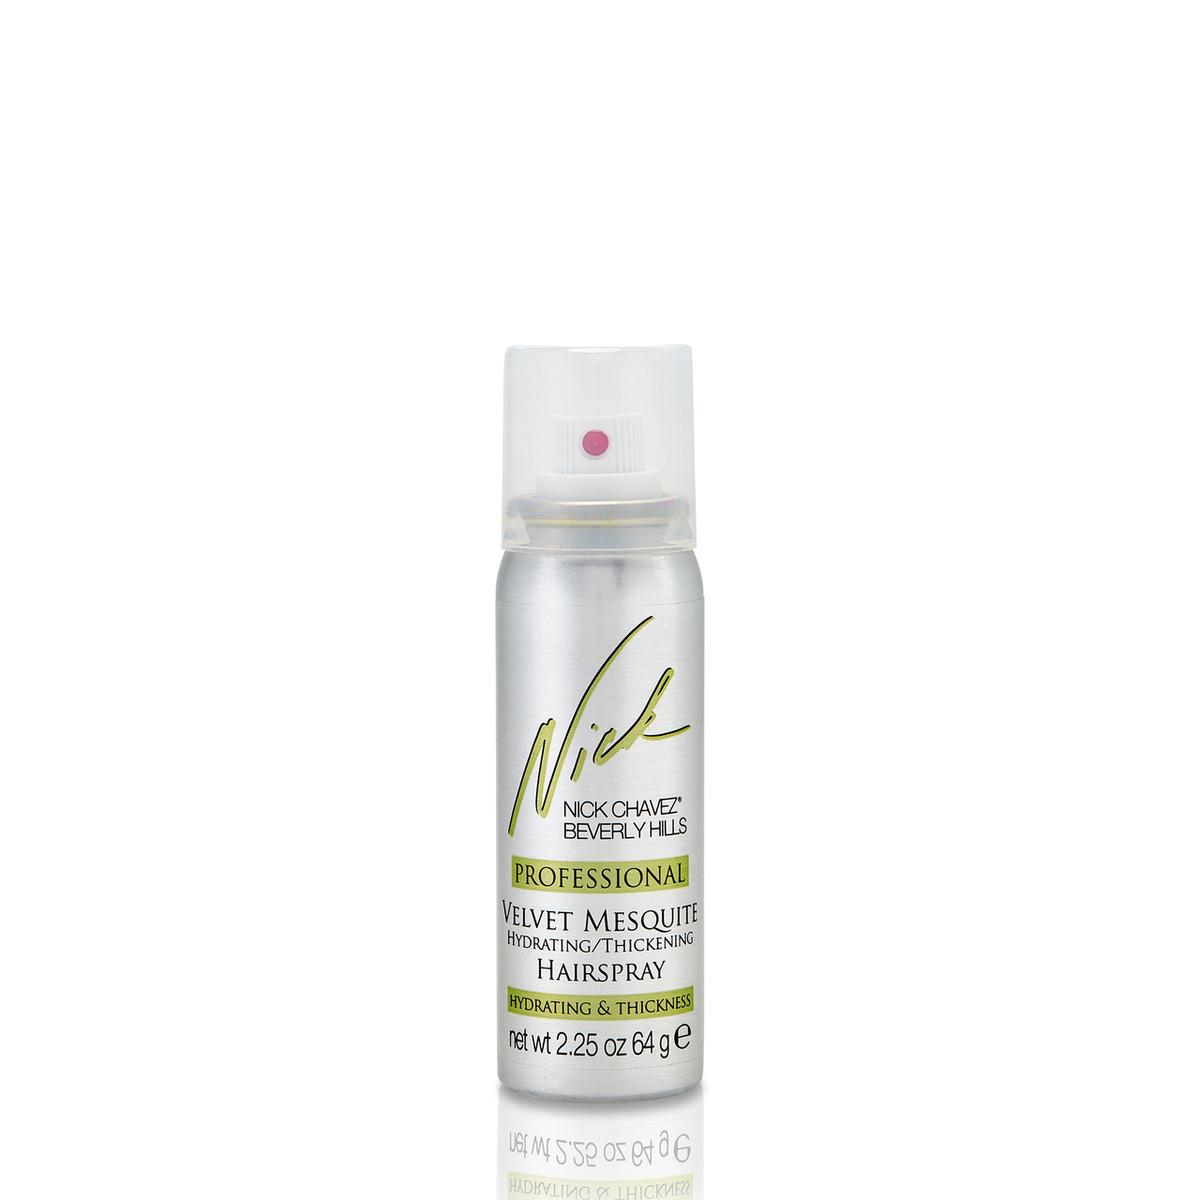 Velvet Mesquite Thickening Hydrating Hairspray 2.25oz